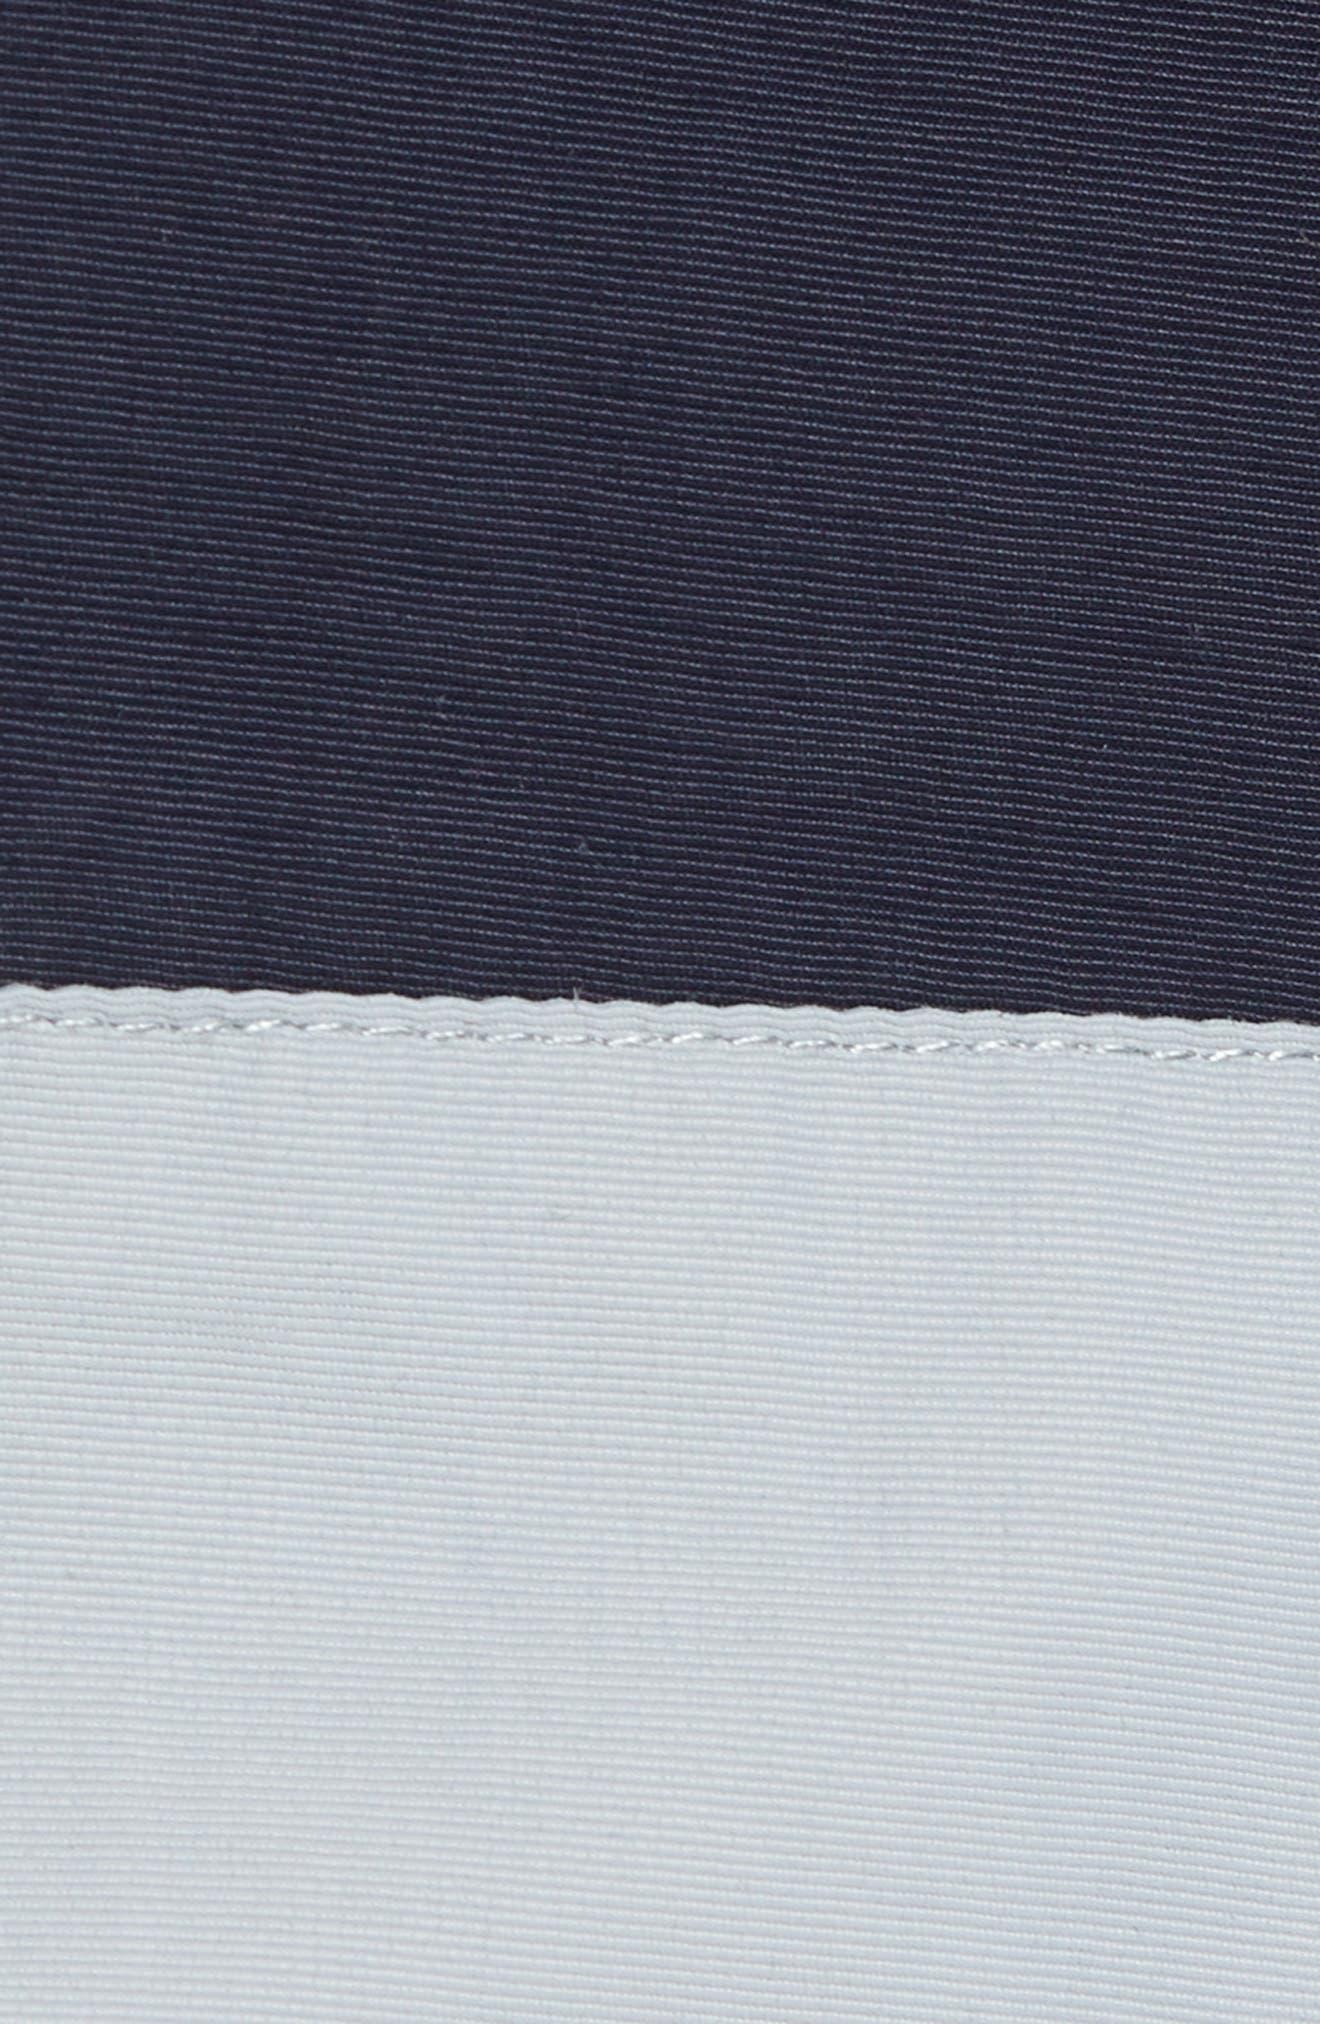 Ennis Board Shorts,                             Alternate thumbnail 5, color,                             408